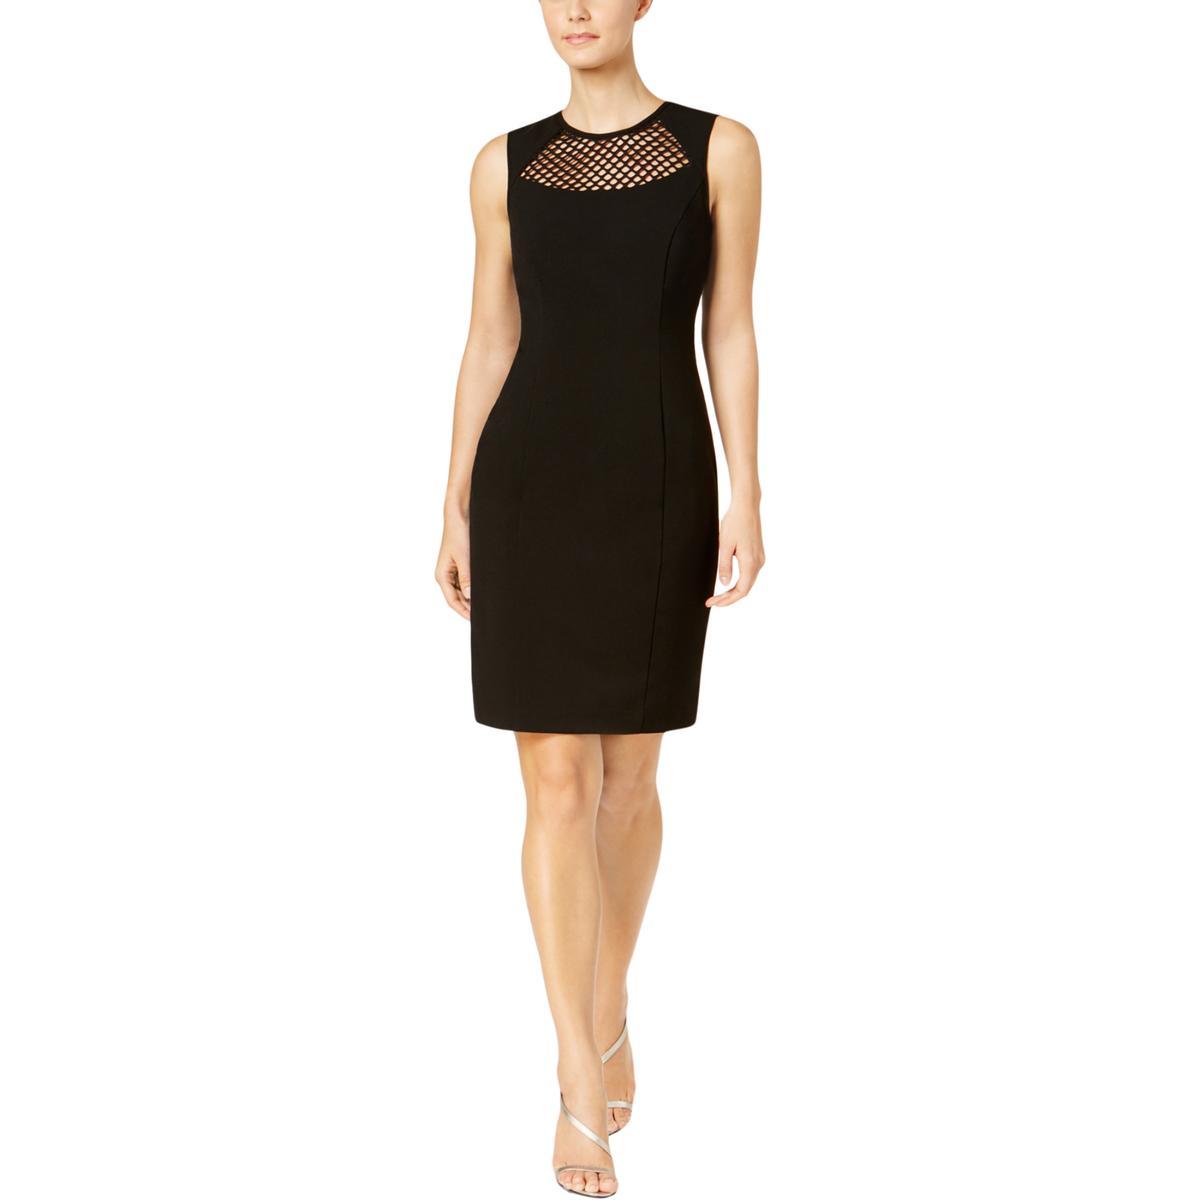 f874b88bfa6e1 Details about Calvin Klein Womens Black Mesh Inset Sheath Midi Dress Petites  2P BHFO 6120